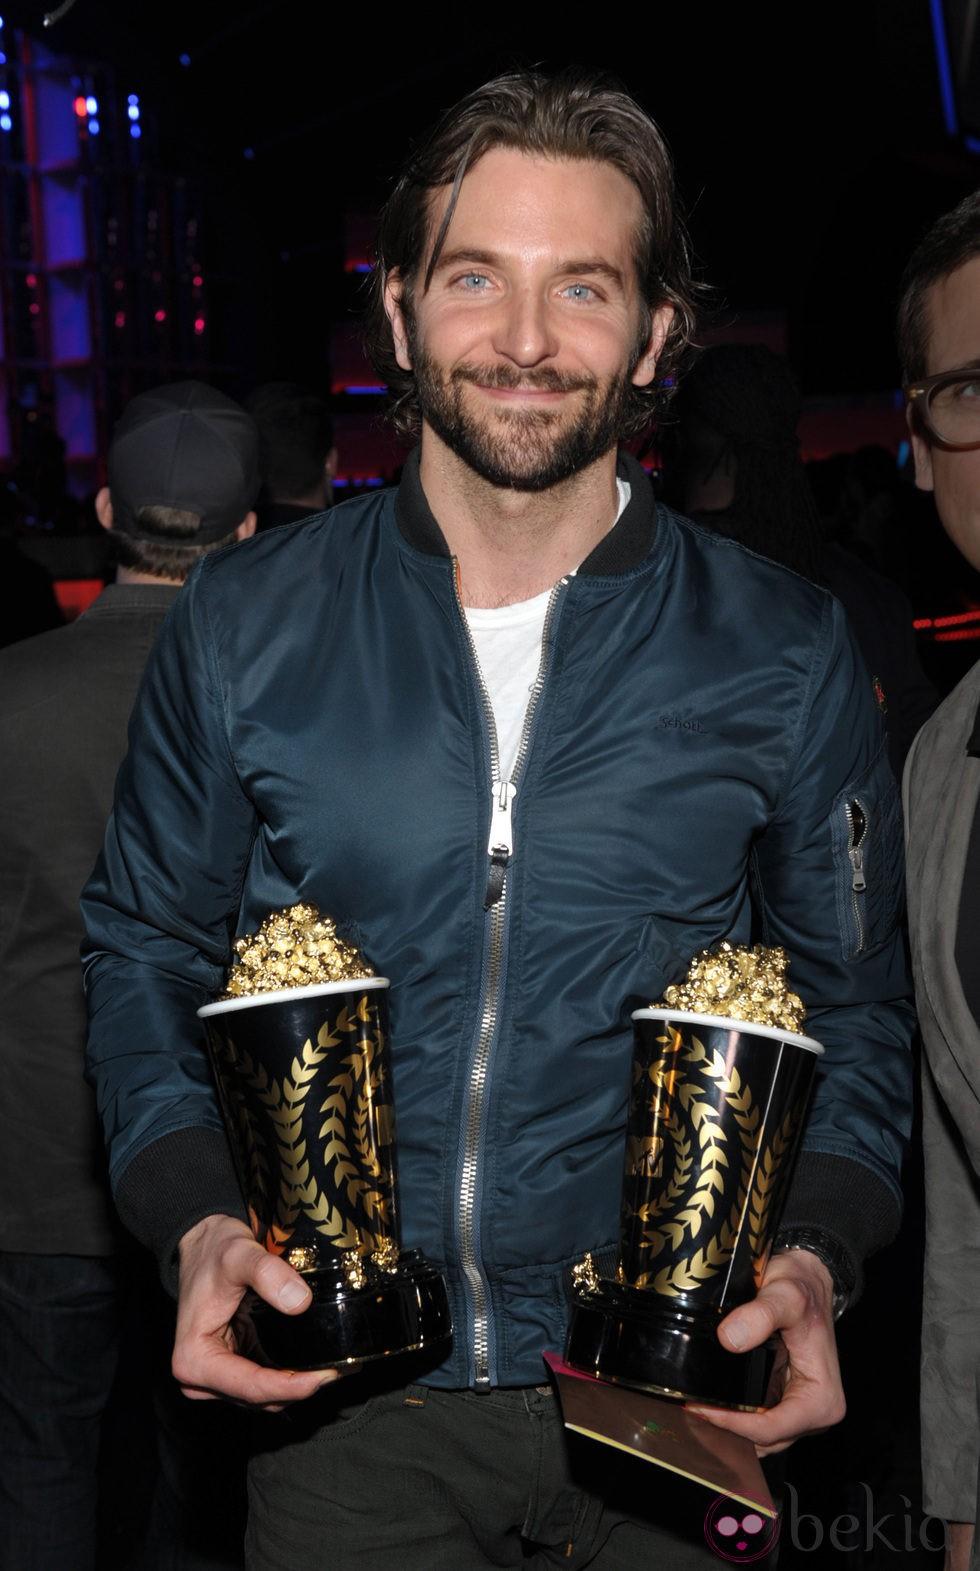 Bradley Cooper 2013 Mtv Movie Awards - Viewing Gallery Bradley Cooper